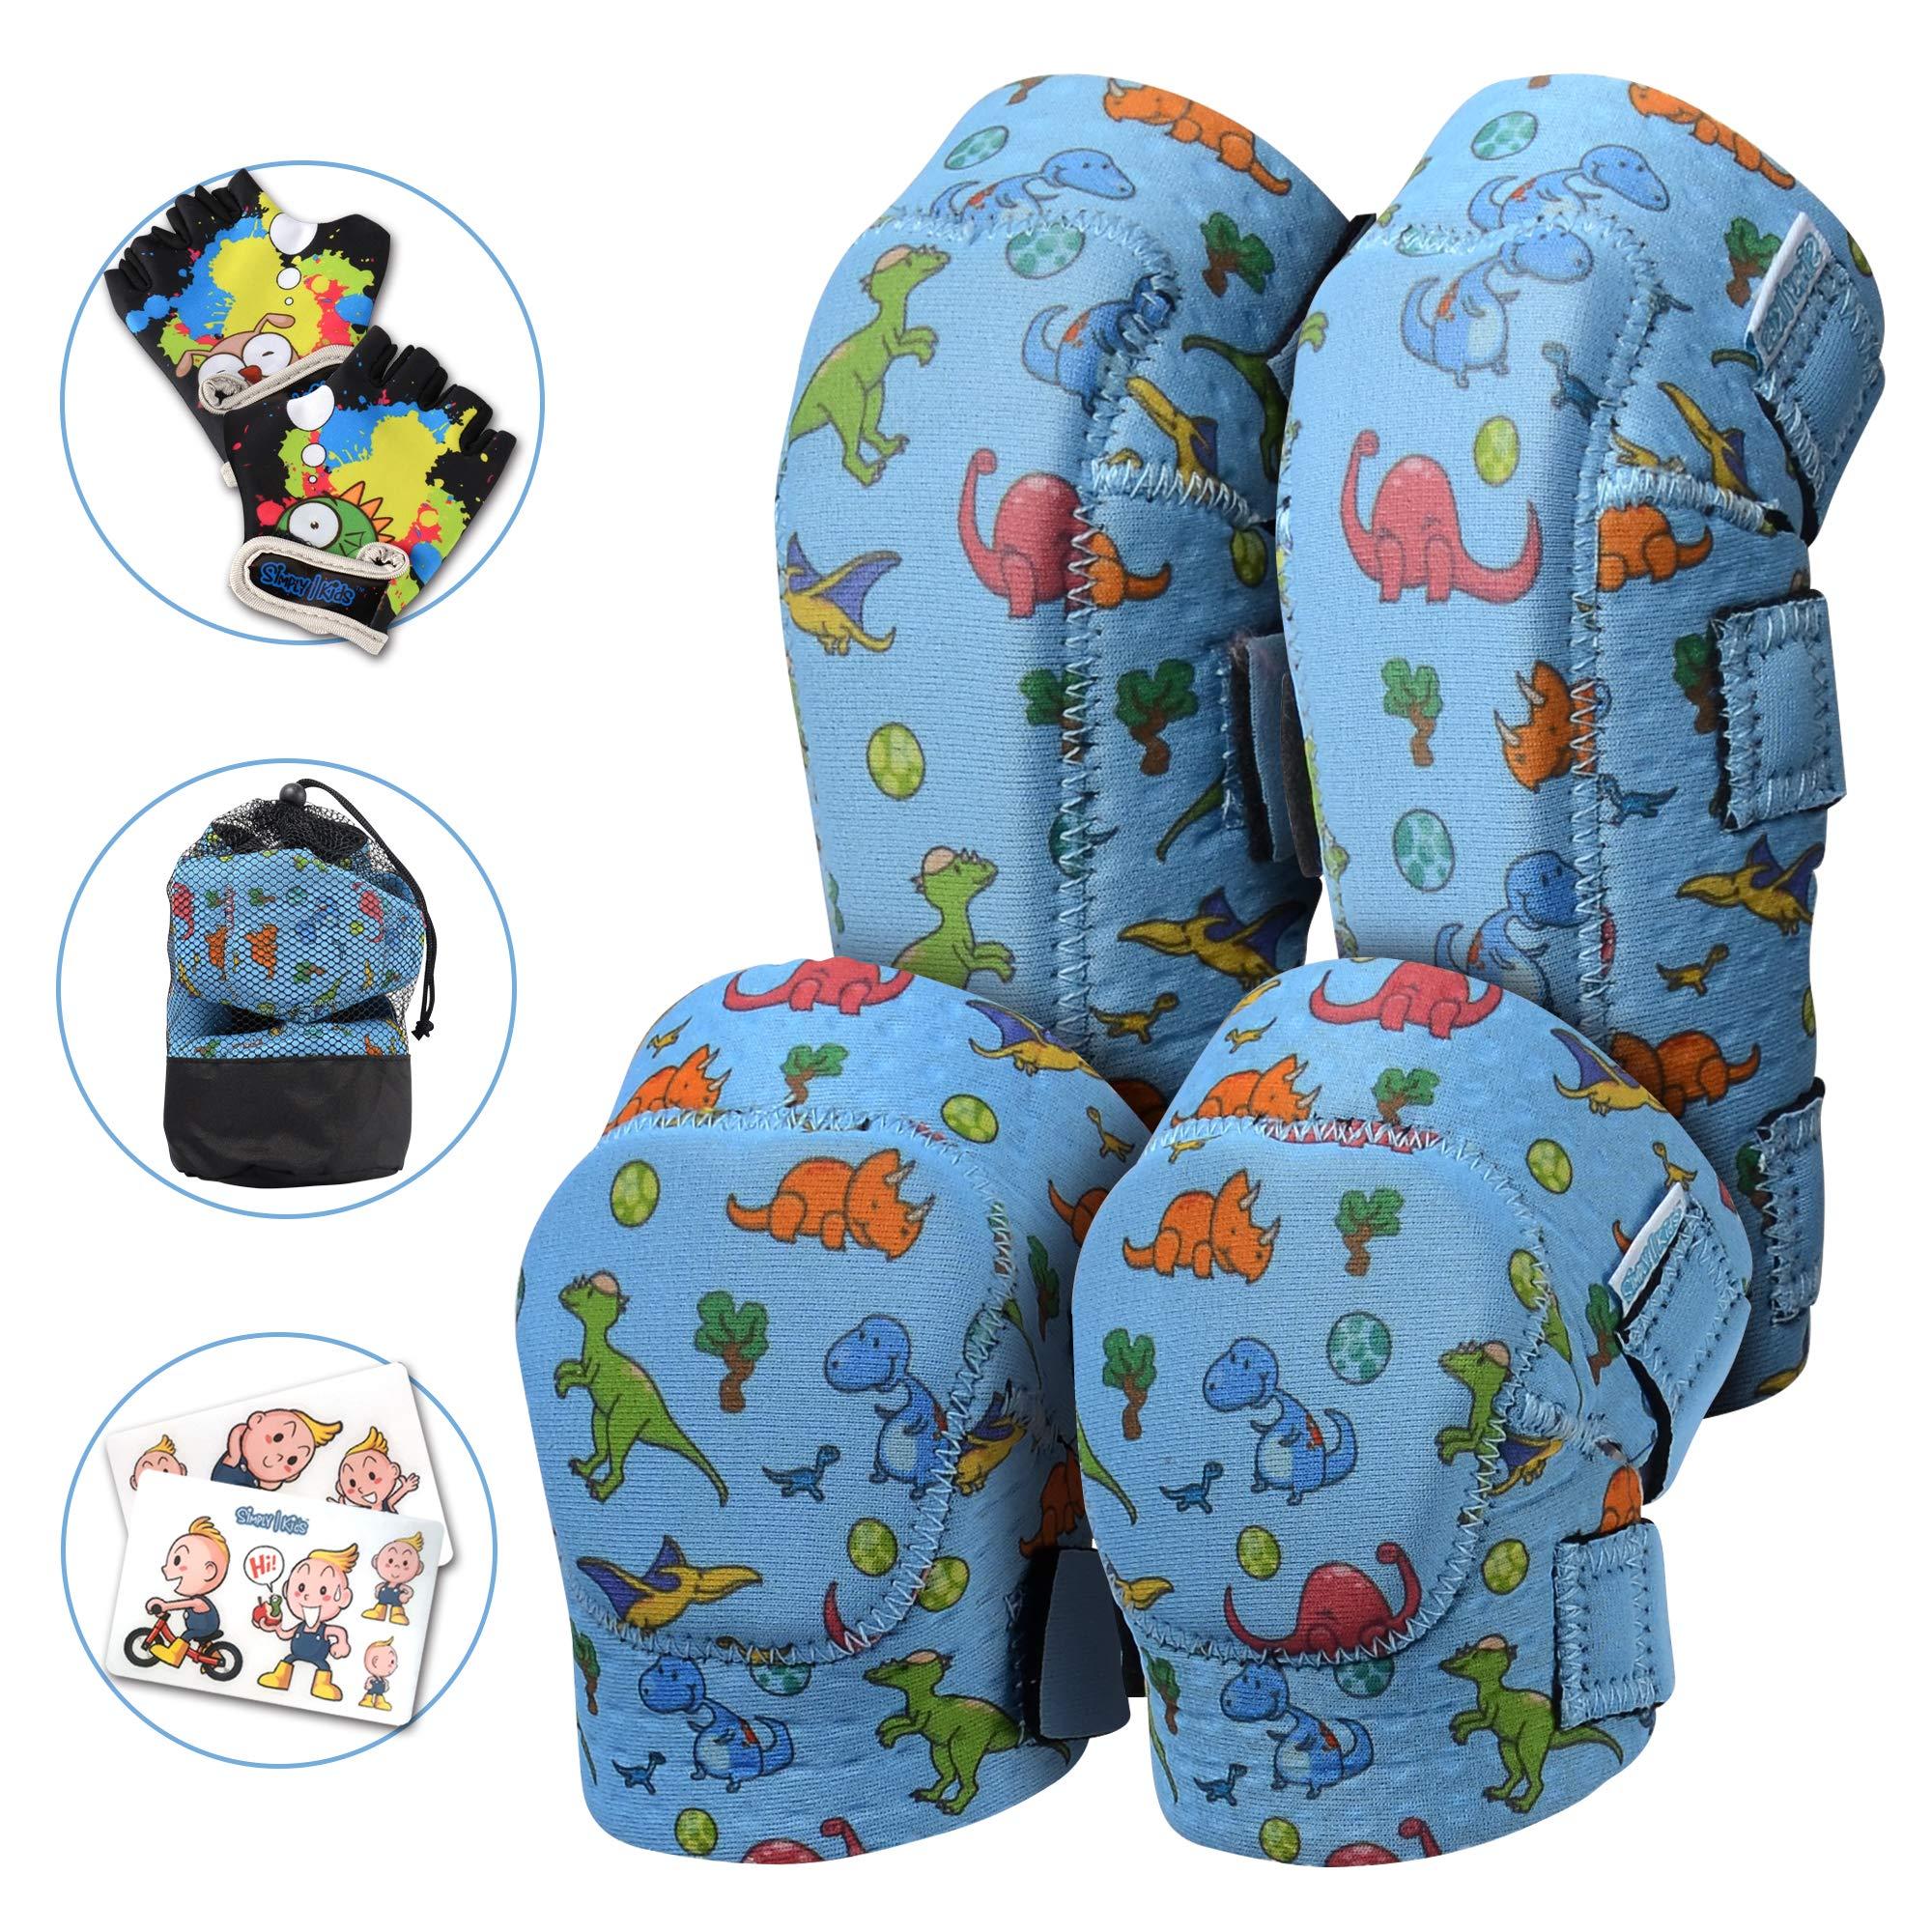 Innovative Soft Kids Knee and Elbow Pads with Bike Gloves | Toddler Protective Gear Set w/Mesh Bag | Roller-Skating, Skateboard, Bike for Children Boys Girls (Dinosaur, Medium (4-8 Years))